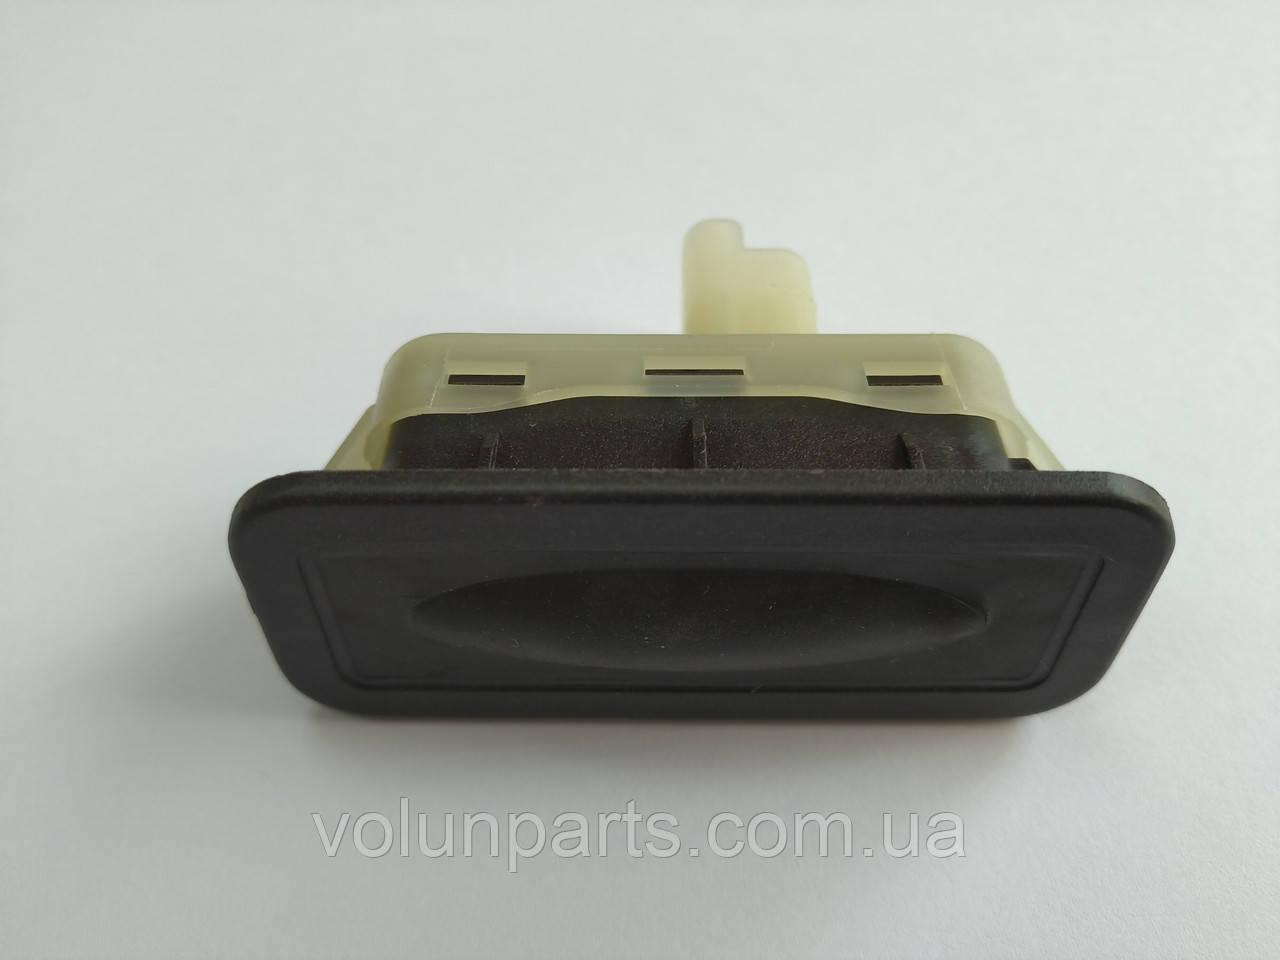 Кнопка відкриття багажника RENAULT CLIO 3-4, GRAND SCENIC 2, MEGANE 2, MODUS, CAPTUR, LAGUNA 3 (8200385515)